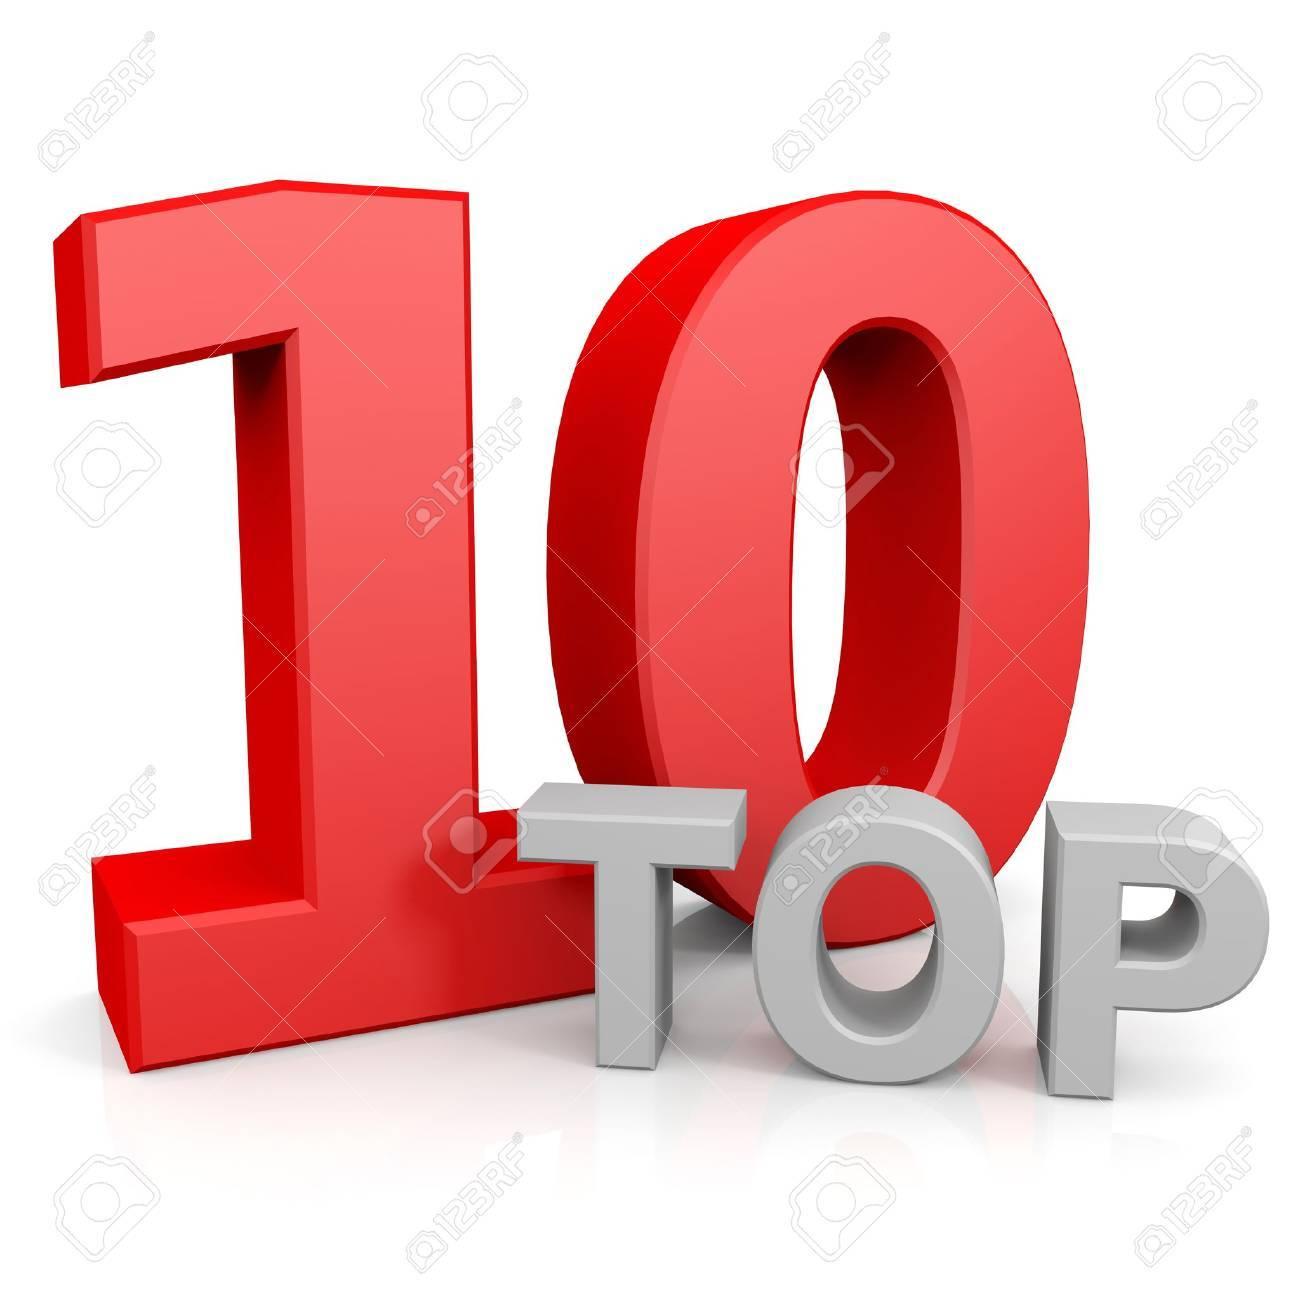 Top ten. Computer generated image. Stock Photo - 12835081